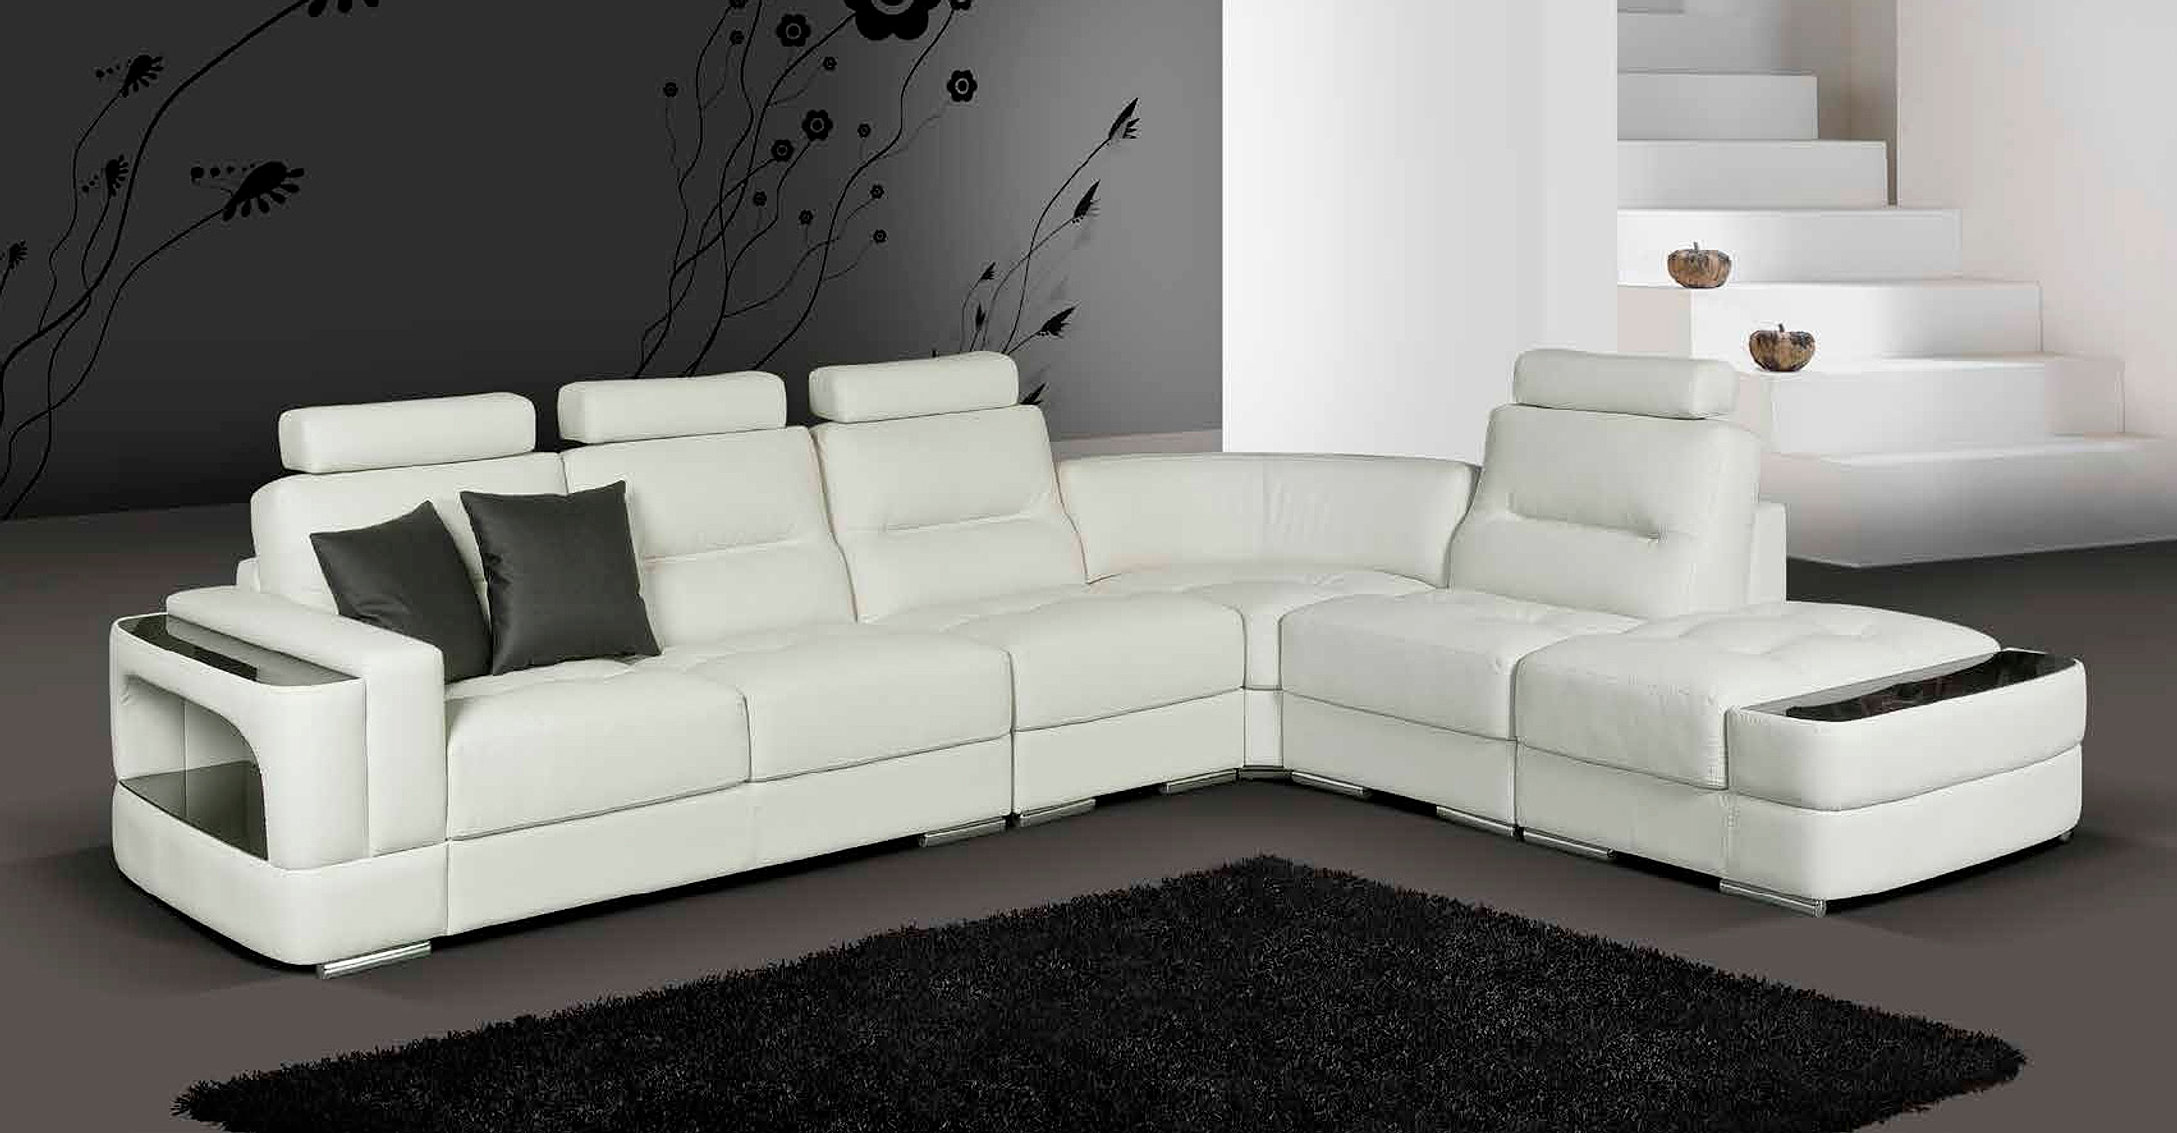 Sofas de dise o muebles monen madrid for Sofas de calidad en madrid